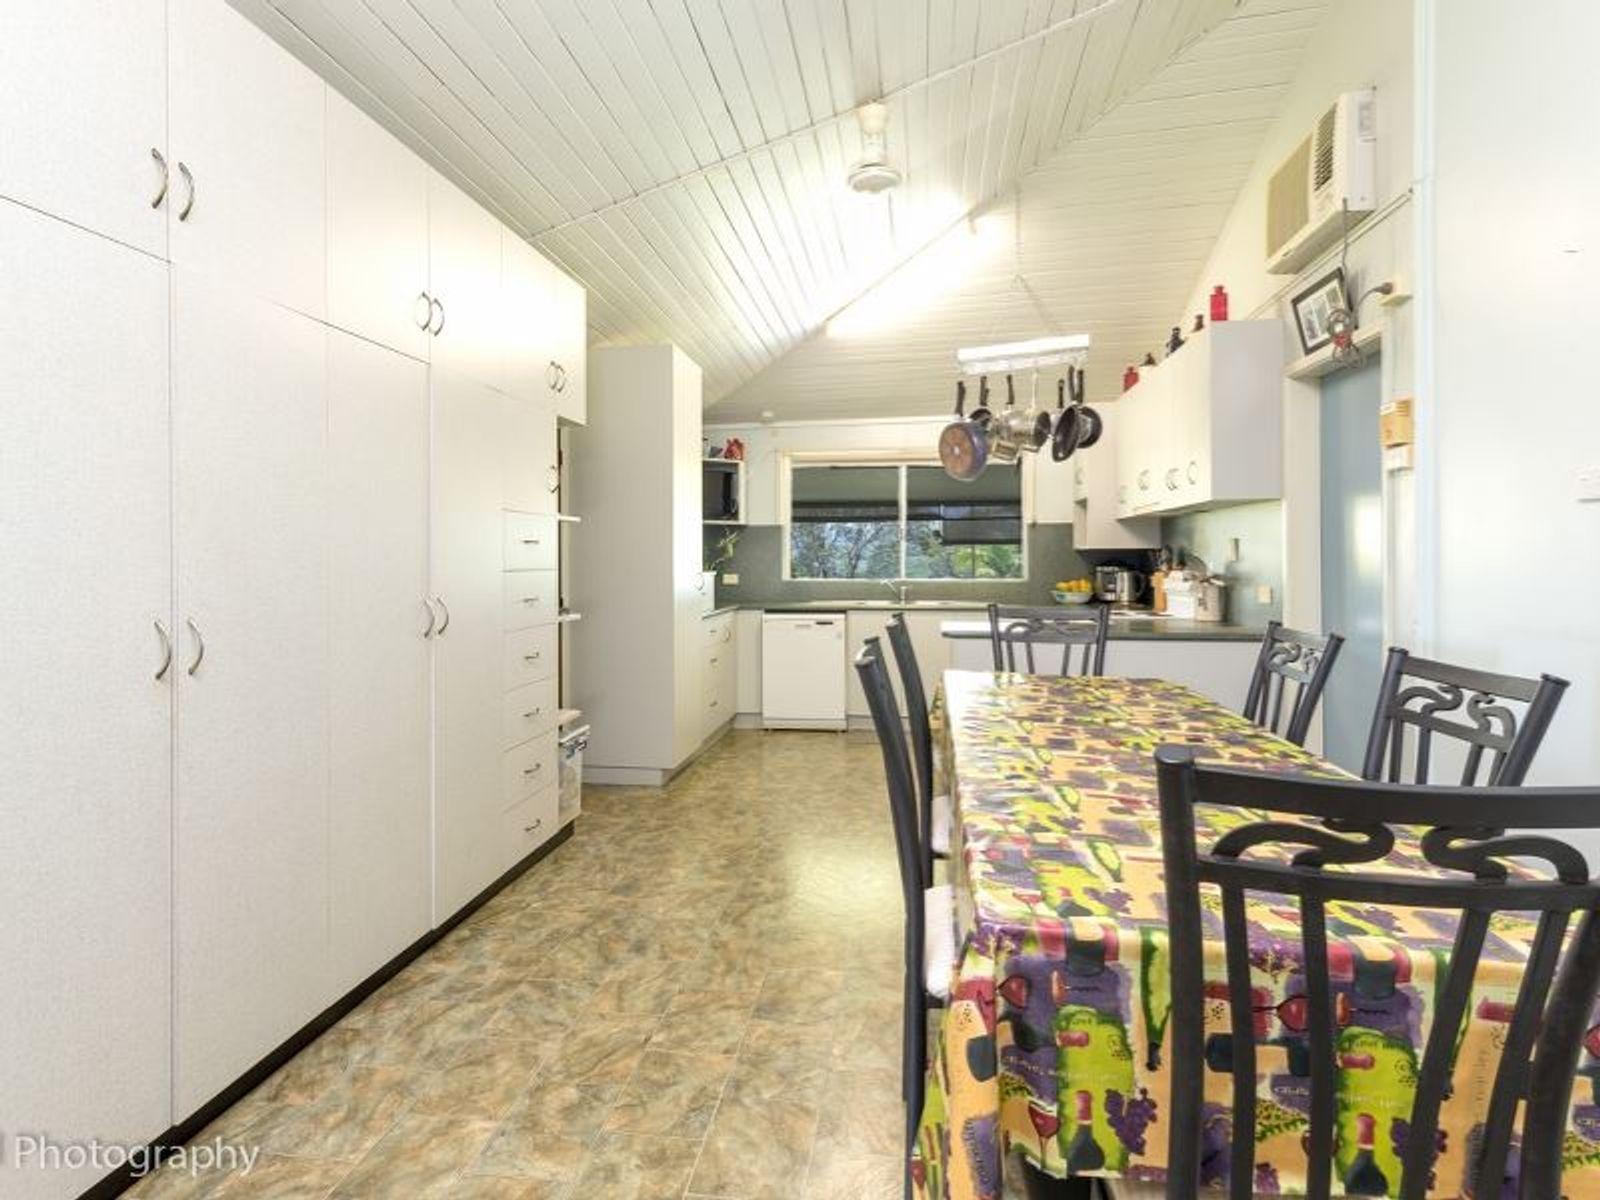 385 Palmerston Highway, O'Briens Hill, QLD 4860